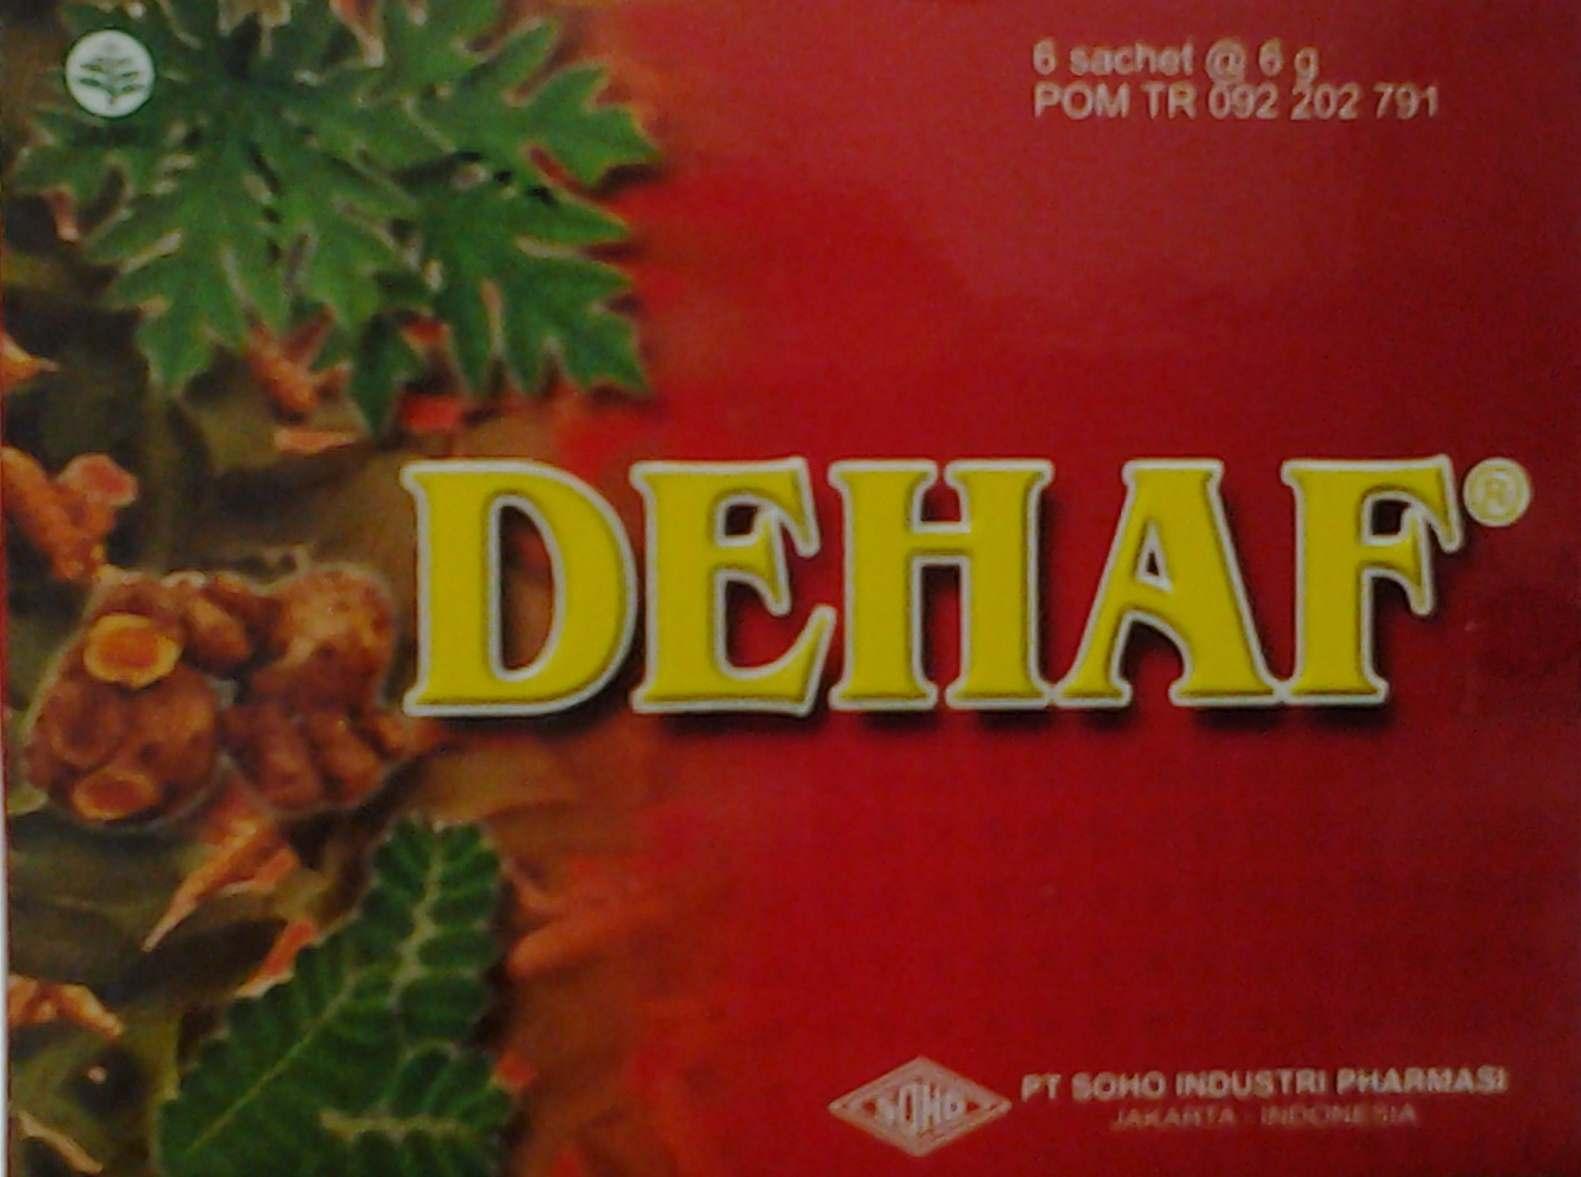 DEHAF GRANUL 6'S